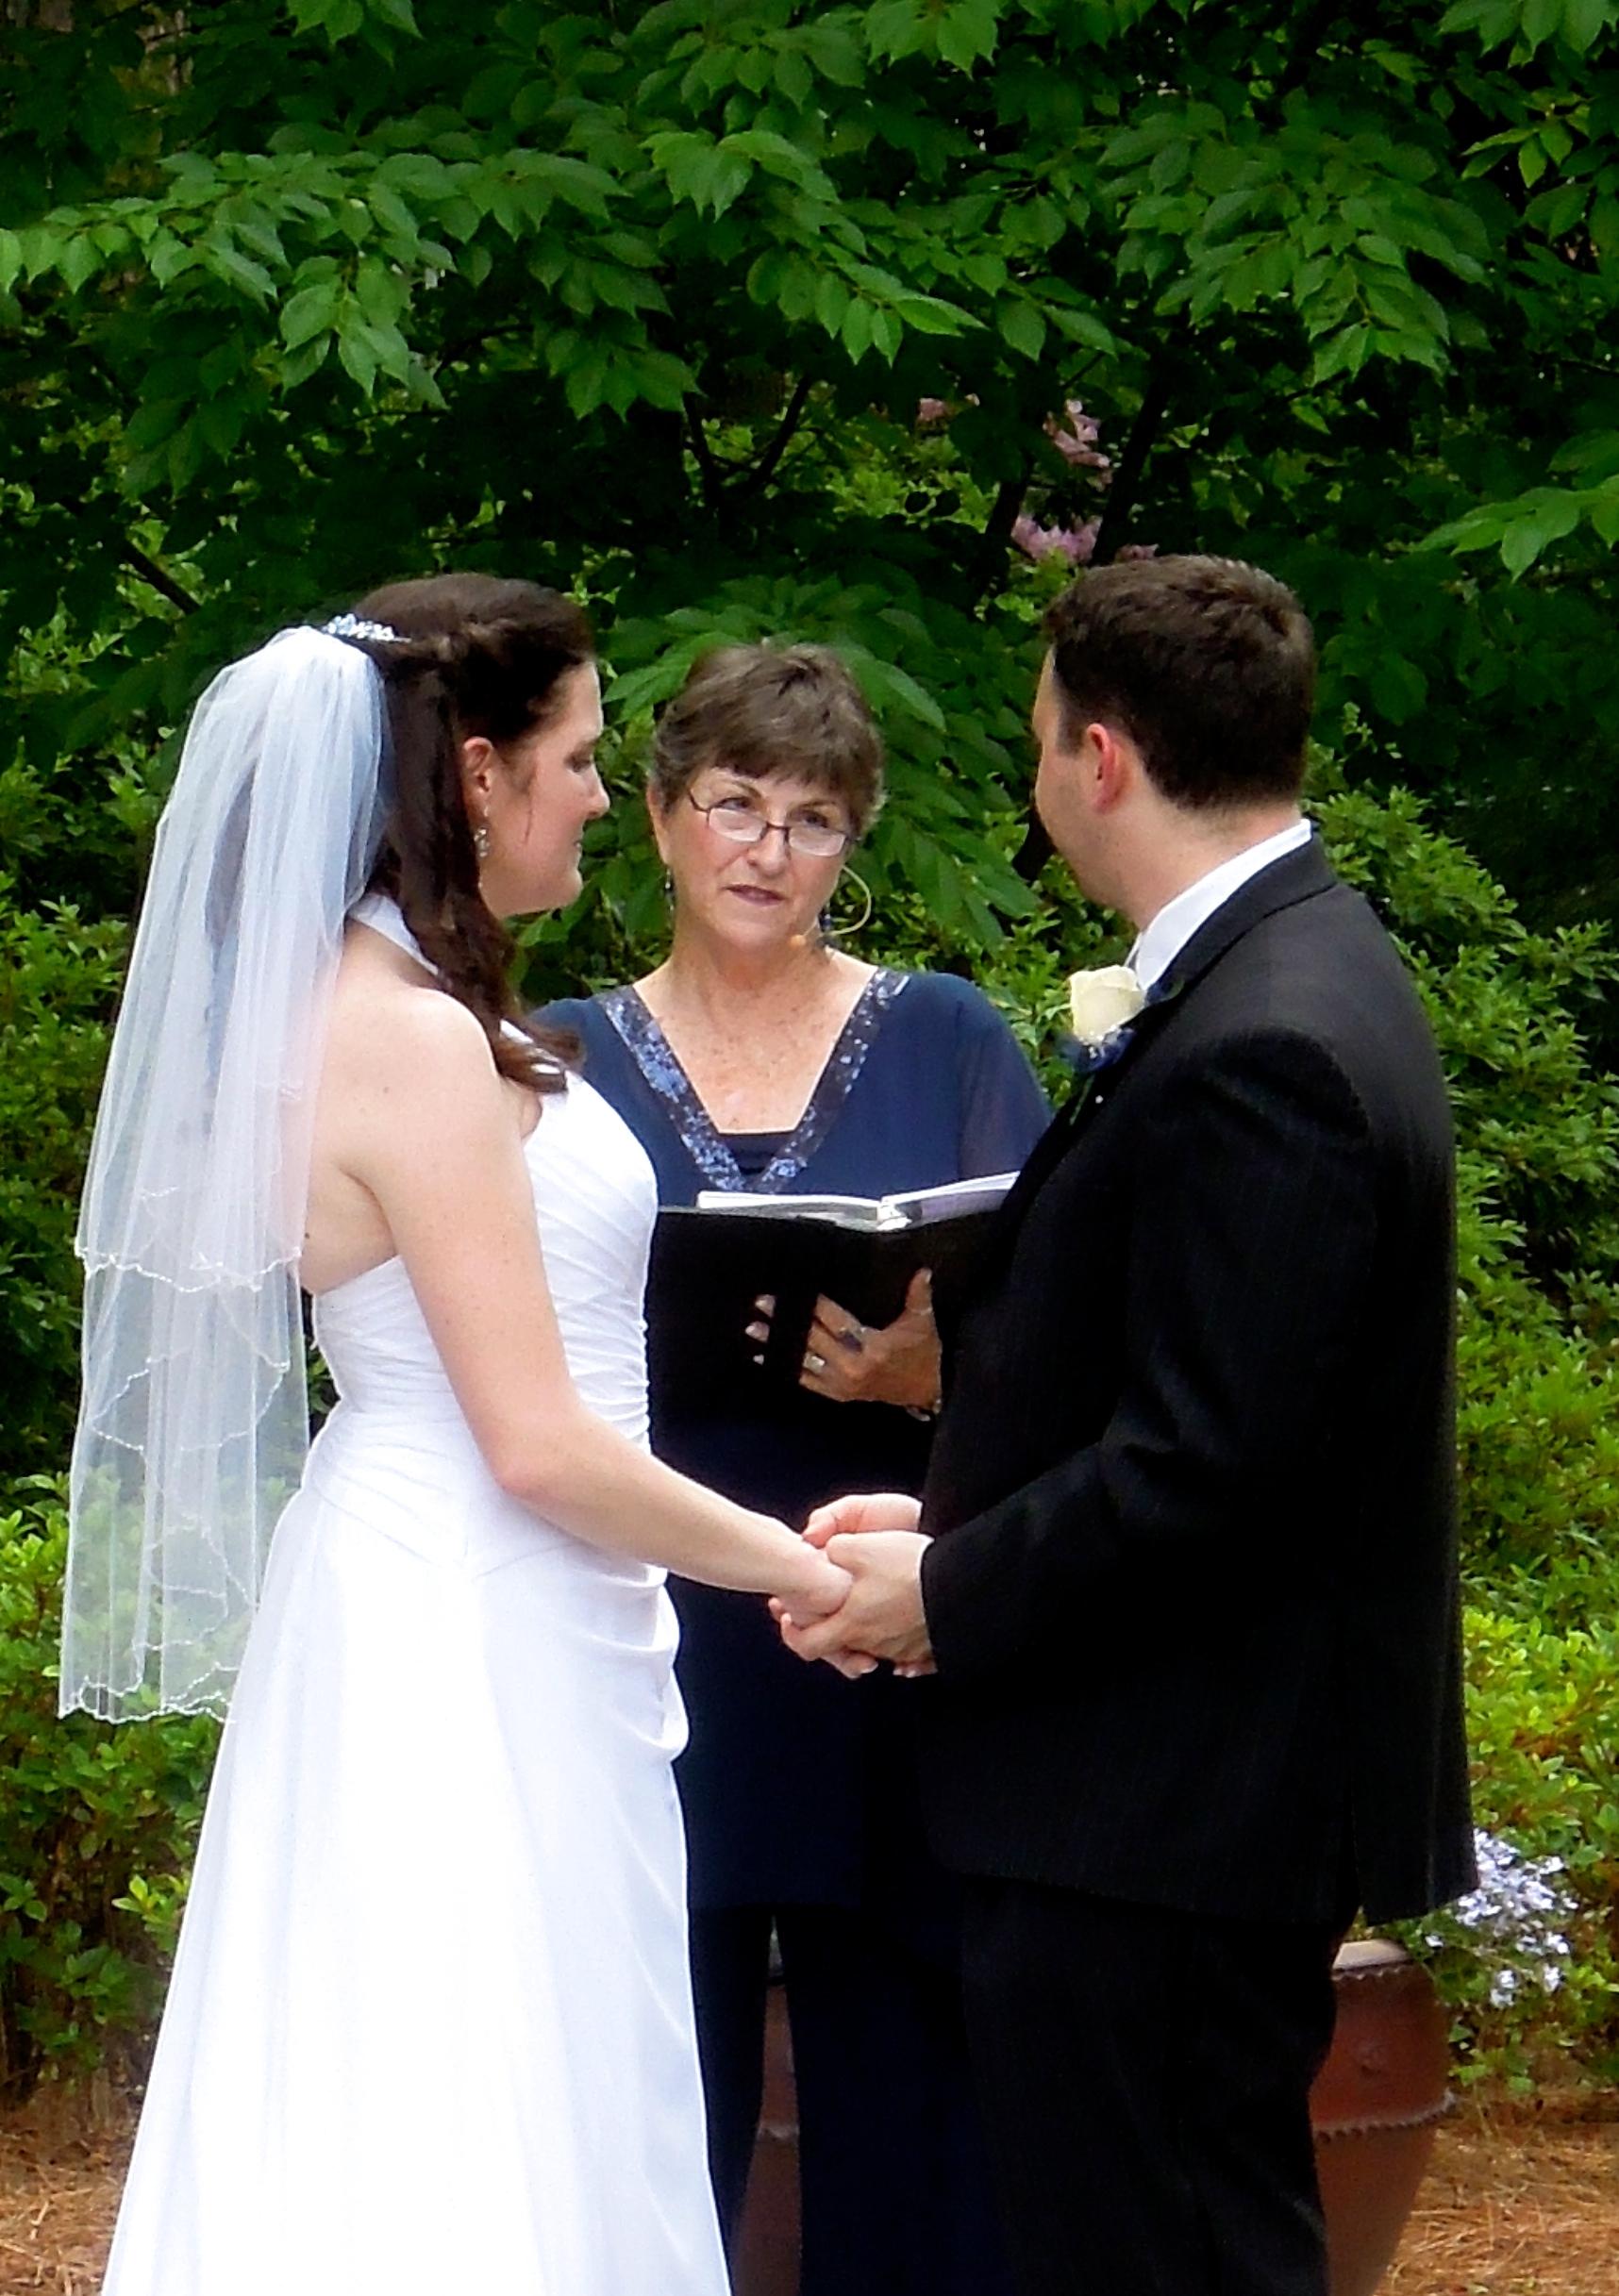 Wedding Ceremony at the WRAL Azalea Garden, Raleigh NC